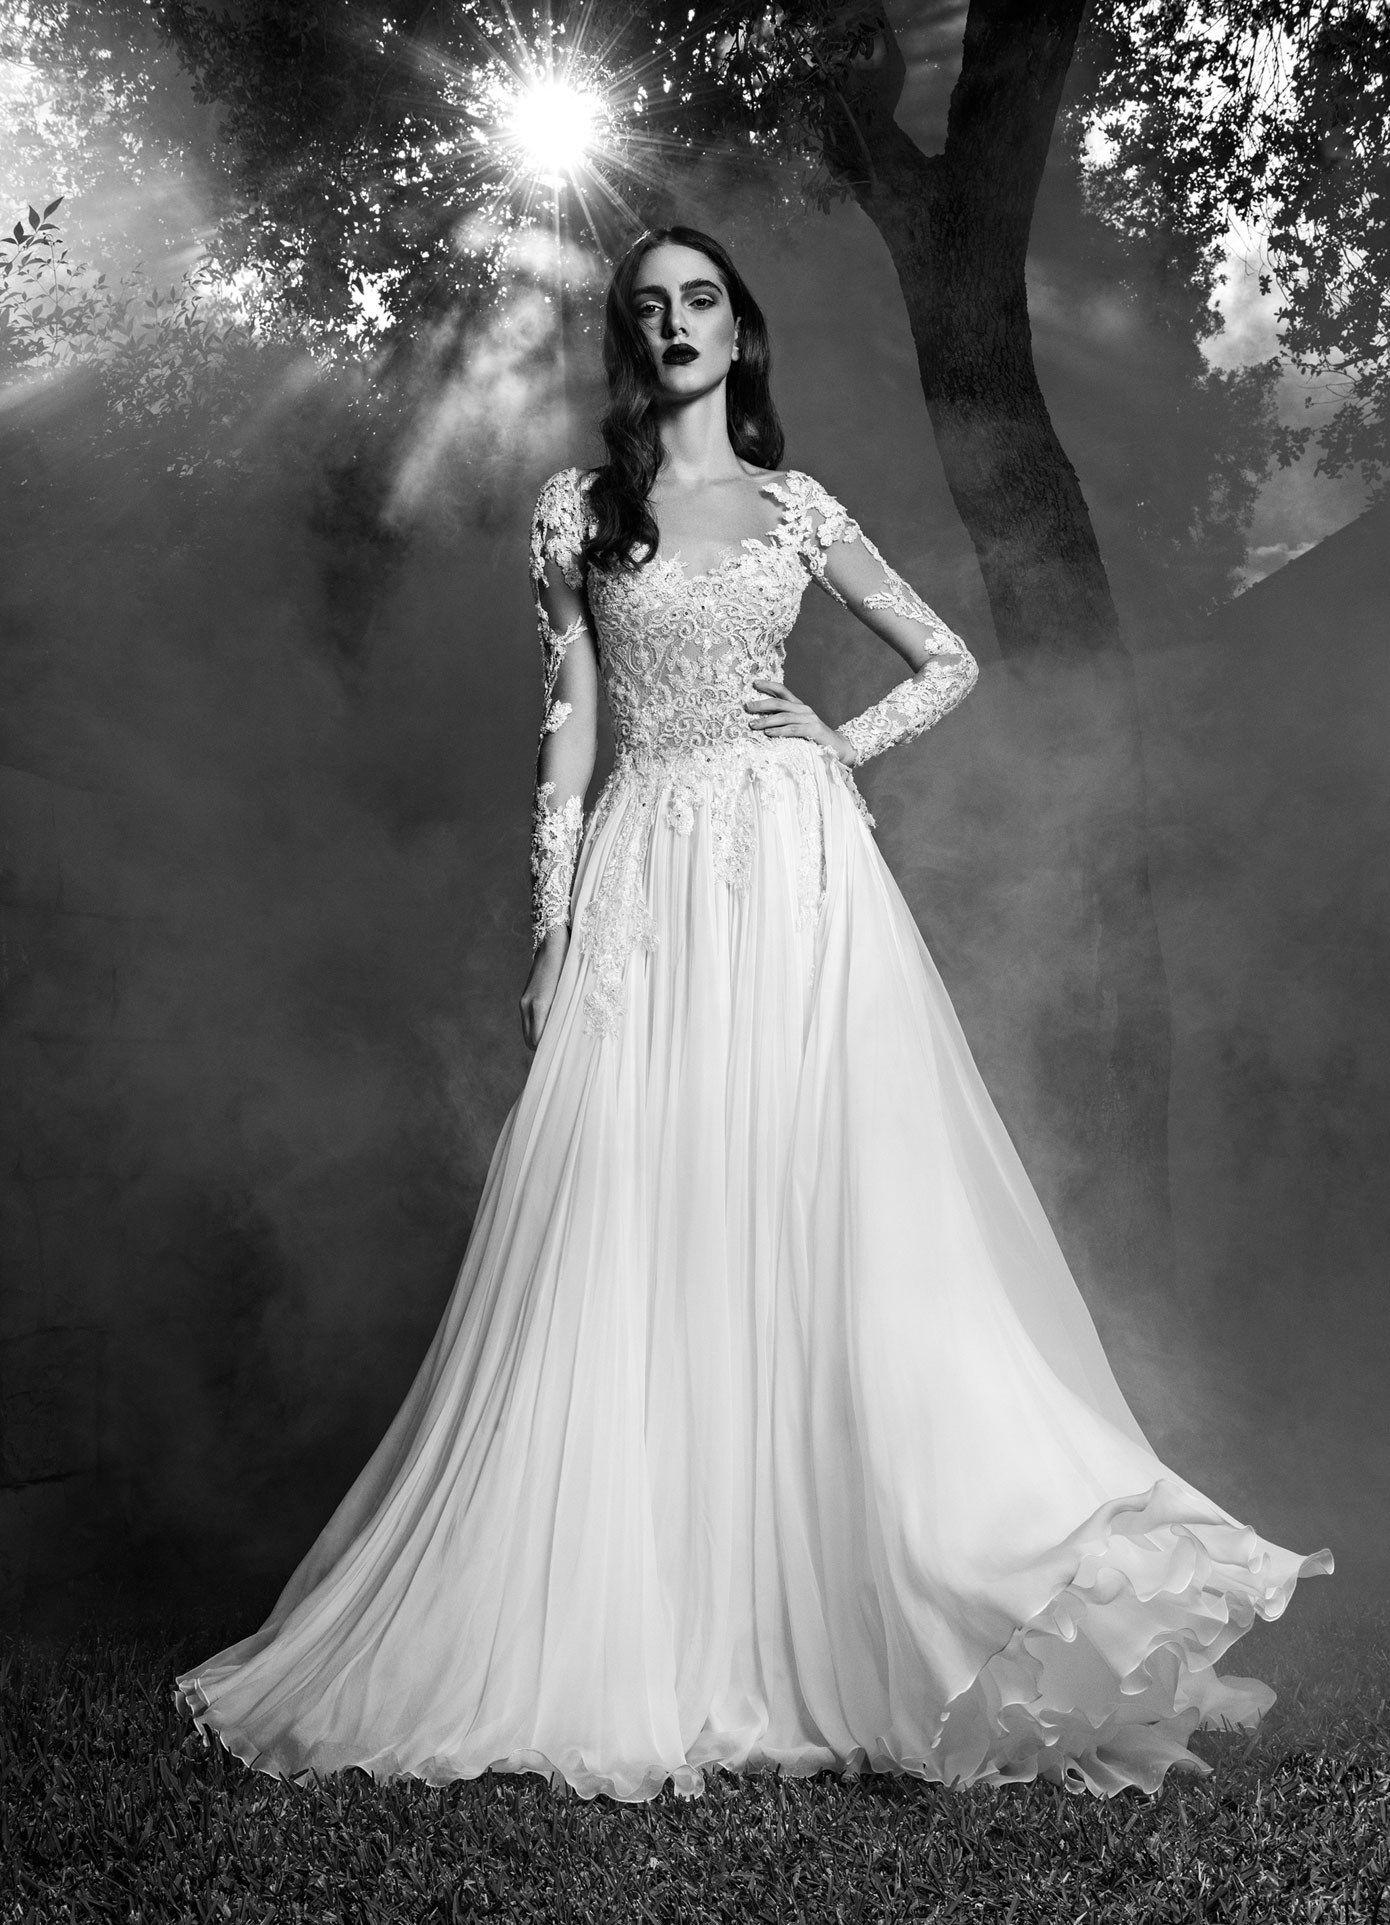 Bridal Fall Dresses Pinterest Zuhair murad Zuhair murad